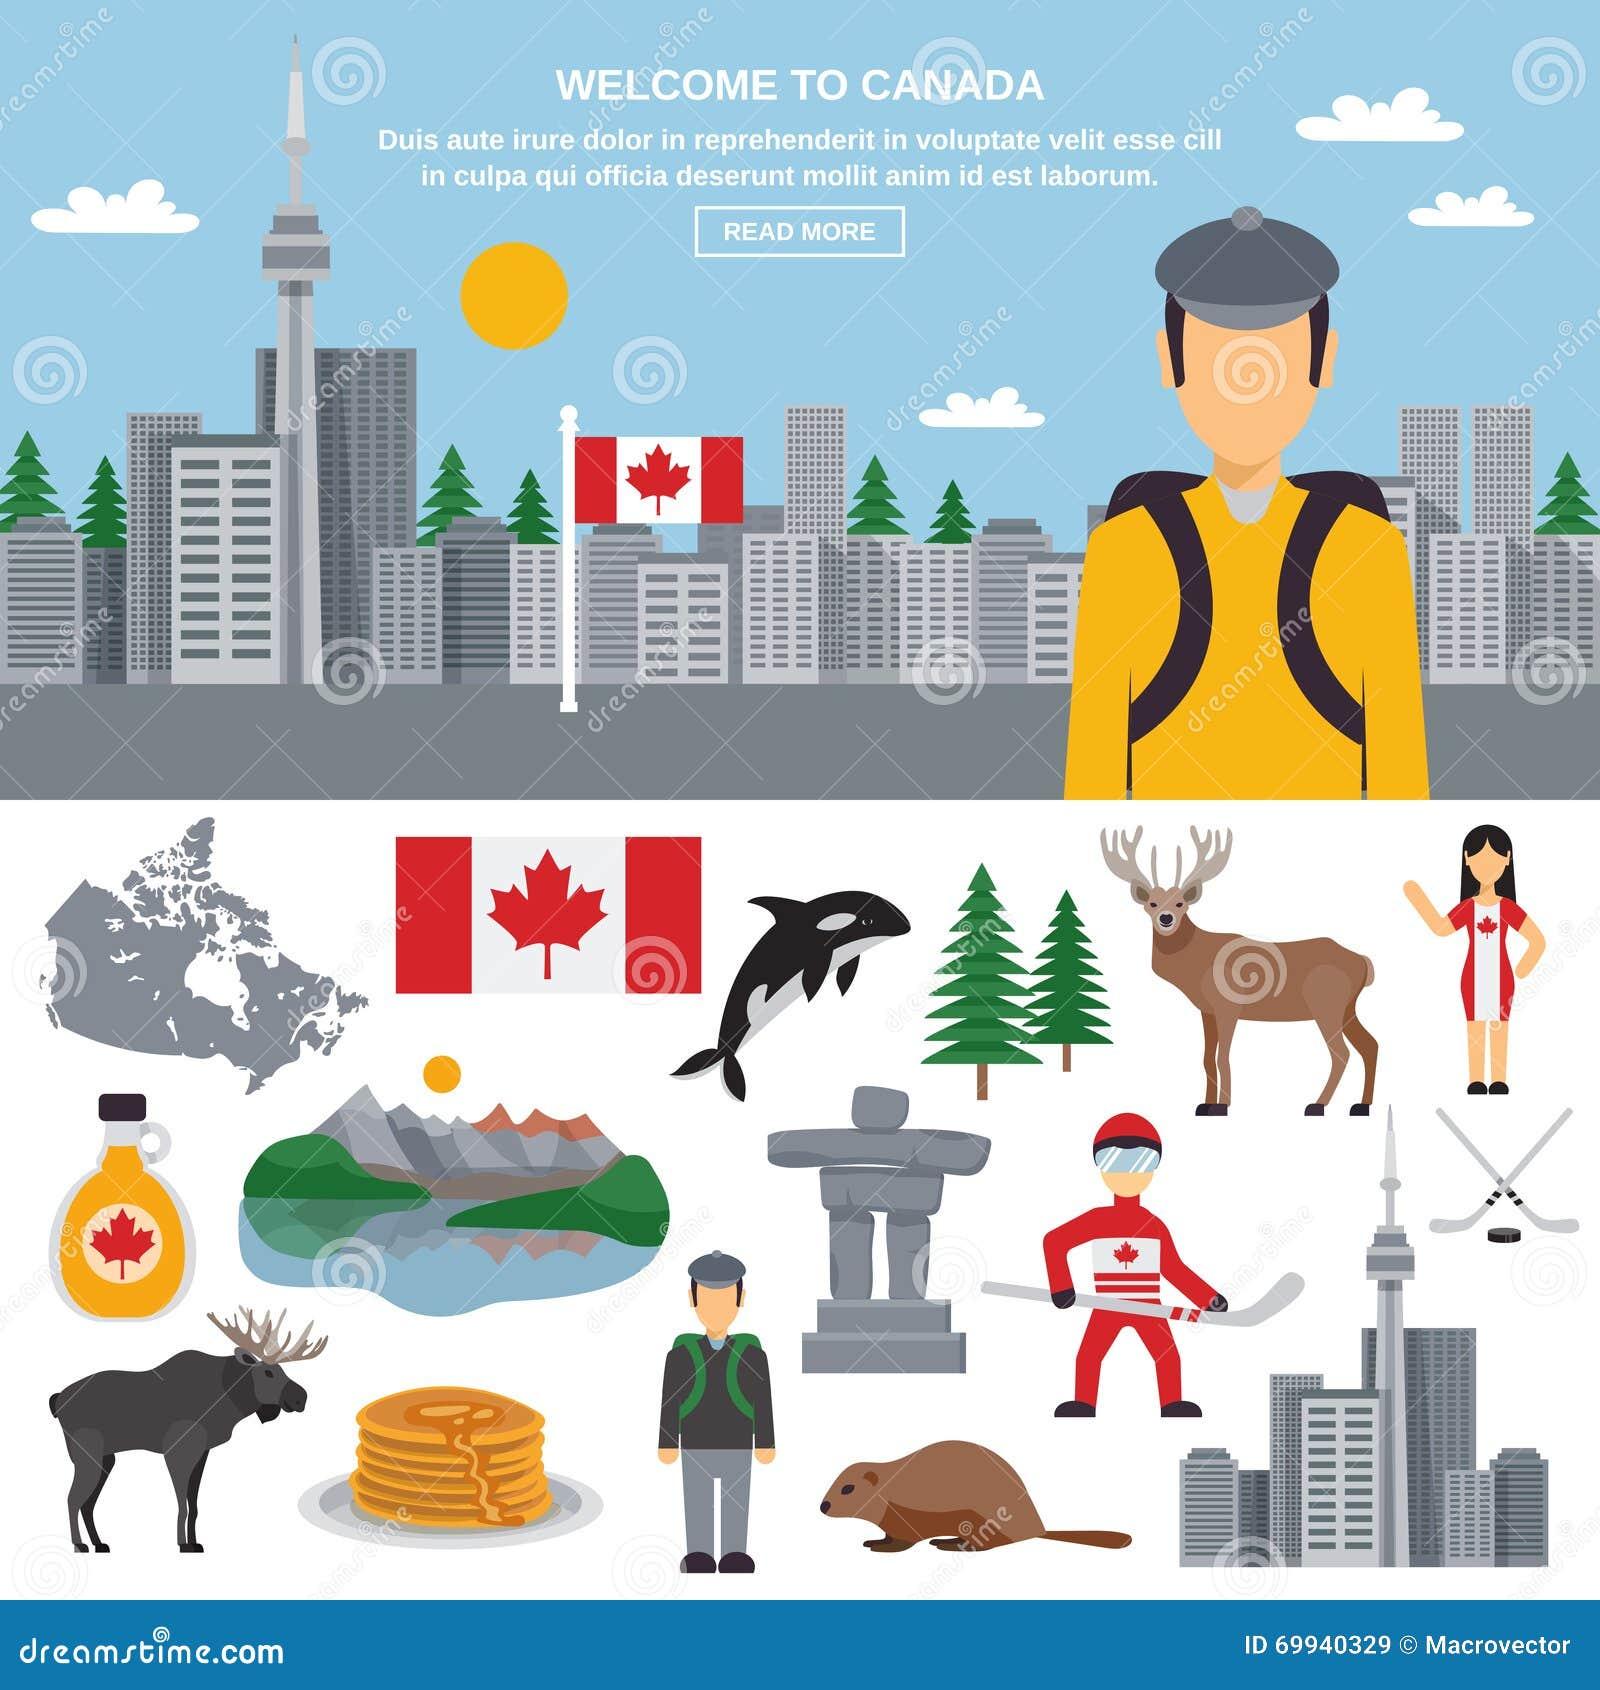 Flat Icon Set Of Canada Stock Vector Illustration Of Flat 69940329